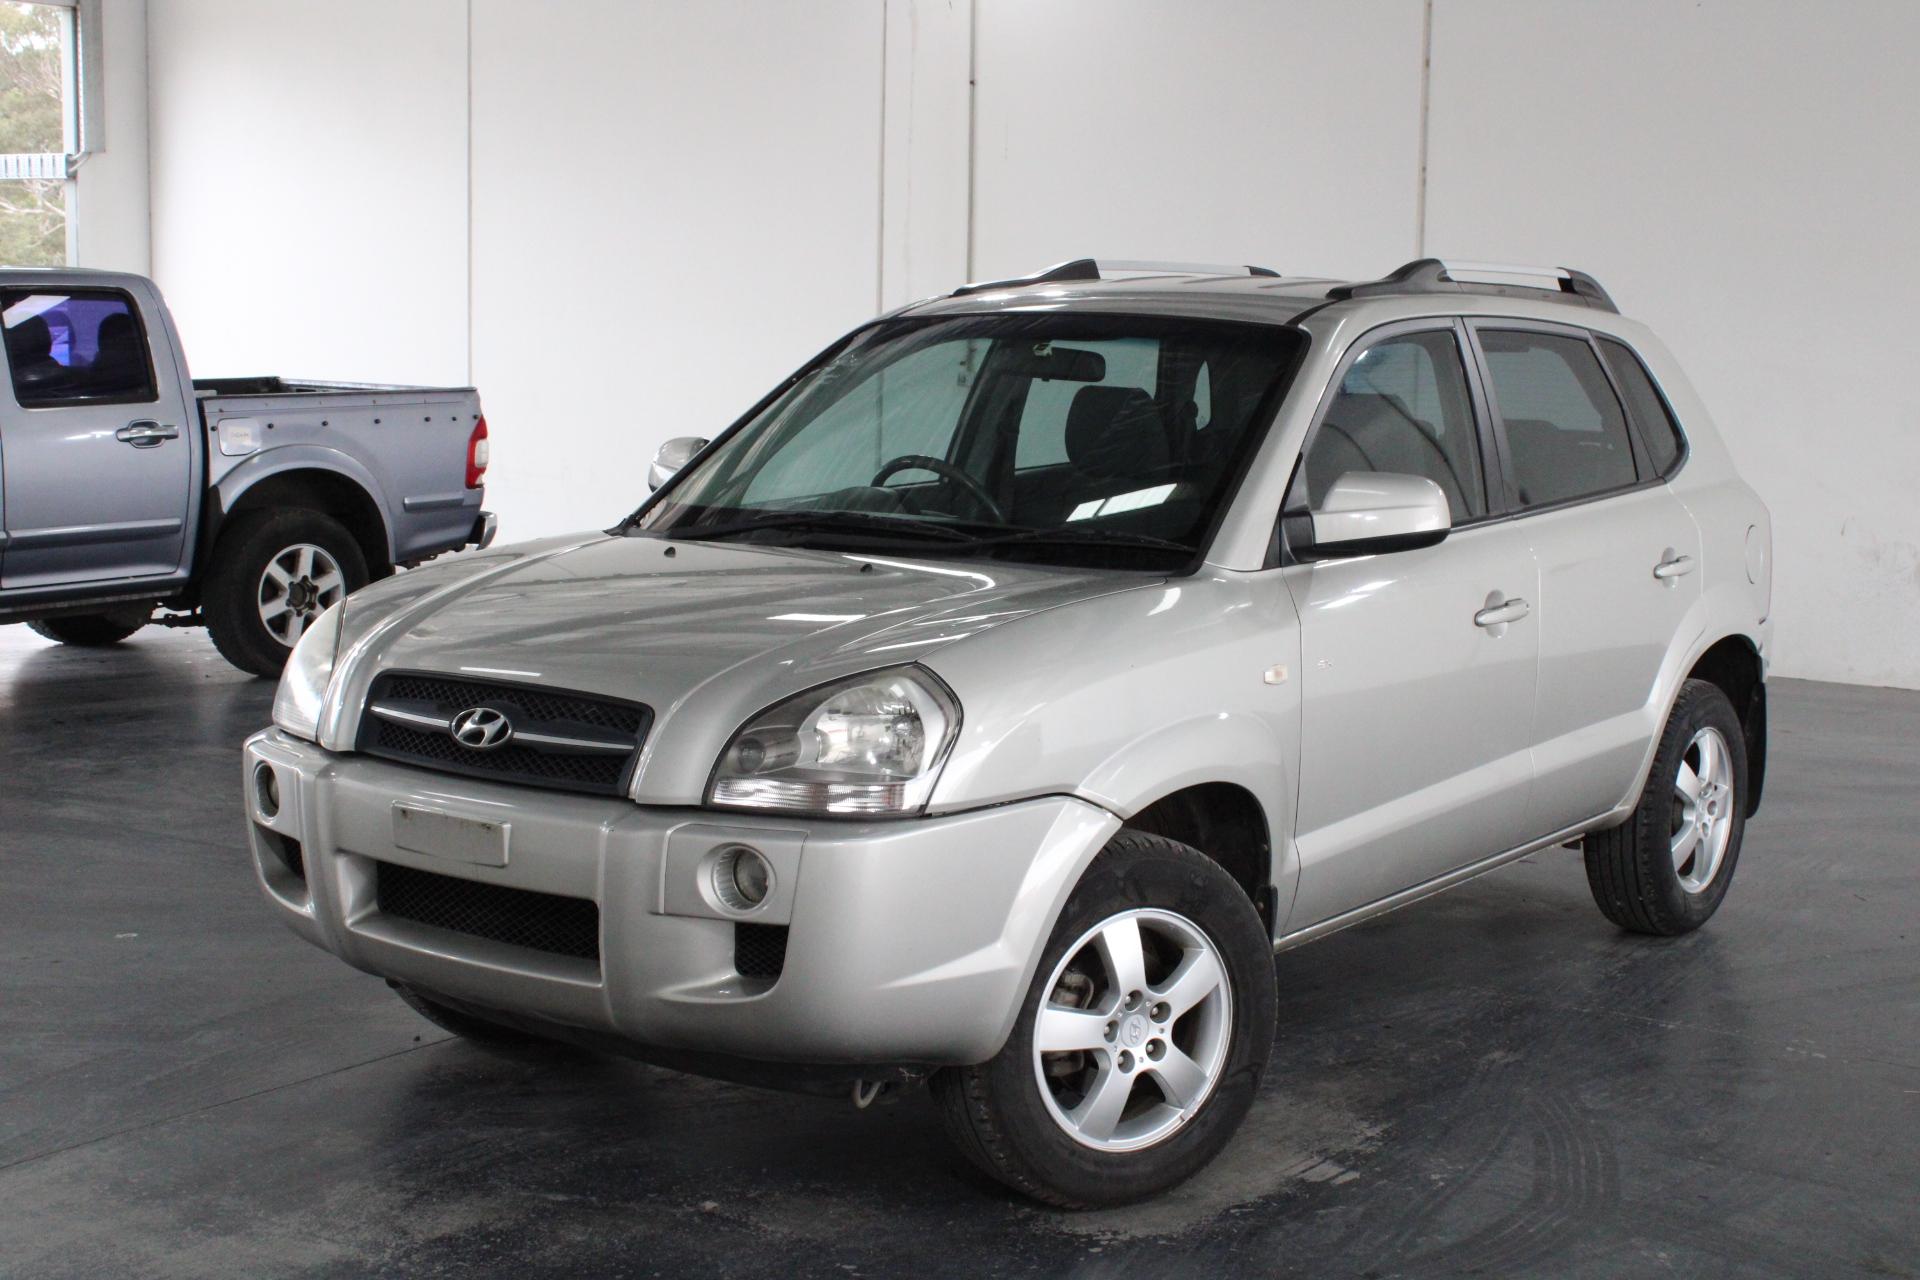 2007 Hyundai Tucson CITY SX Manual Wagon